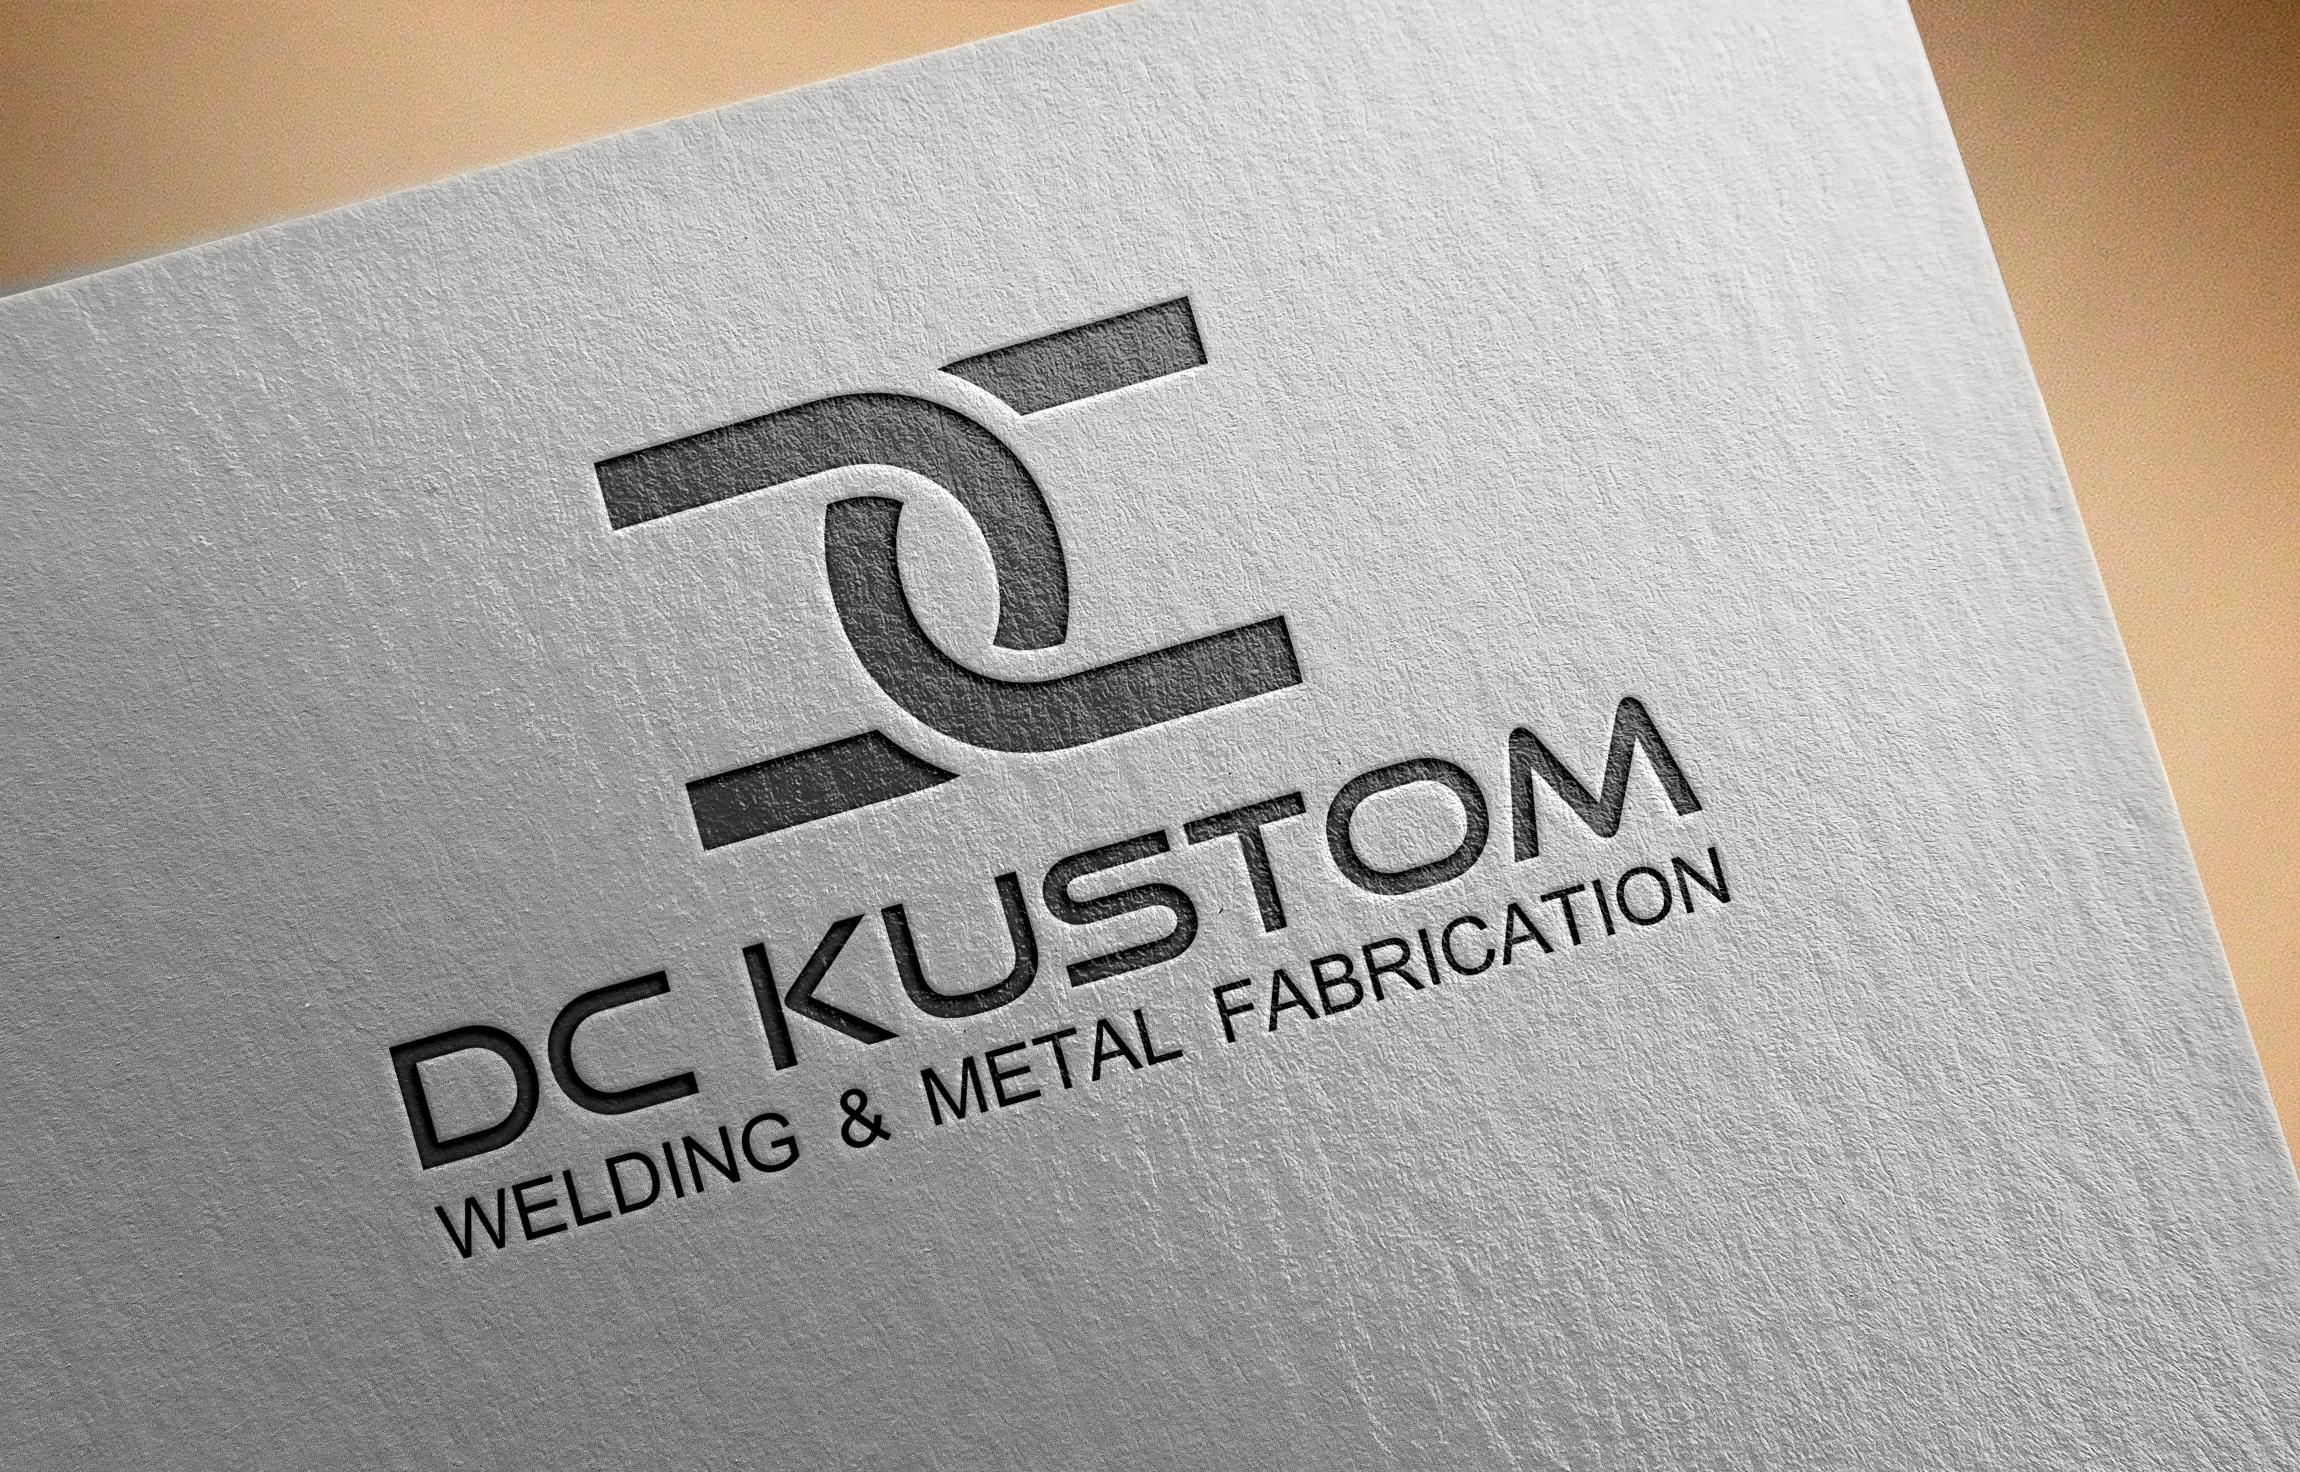 Logo Design by Net Bih - Entry No. 44 in the Logo Design Contest Imaginative Logo Design for DC KUSTOM WELDING & METAL FABRICATION.